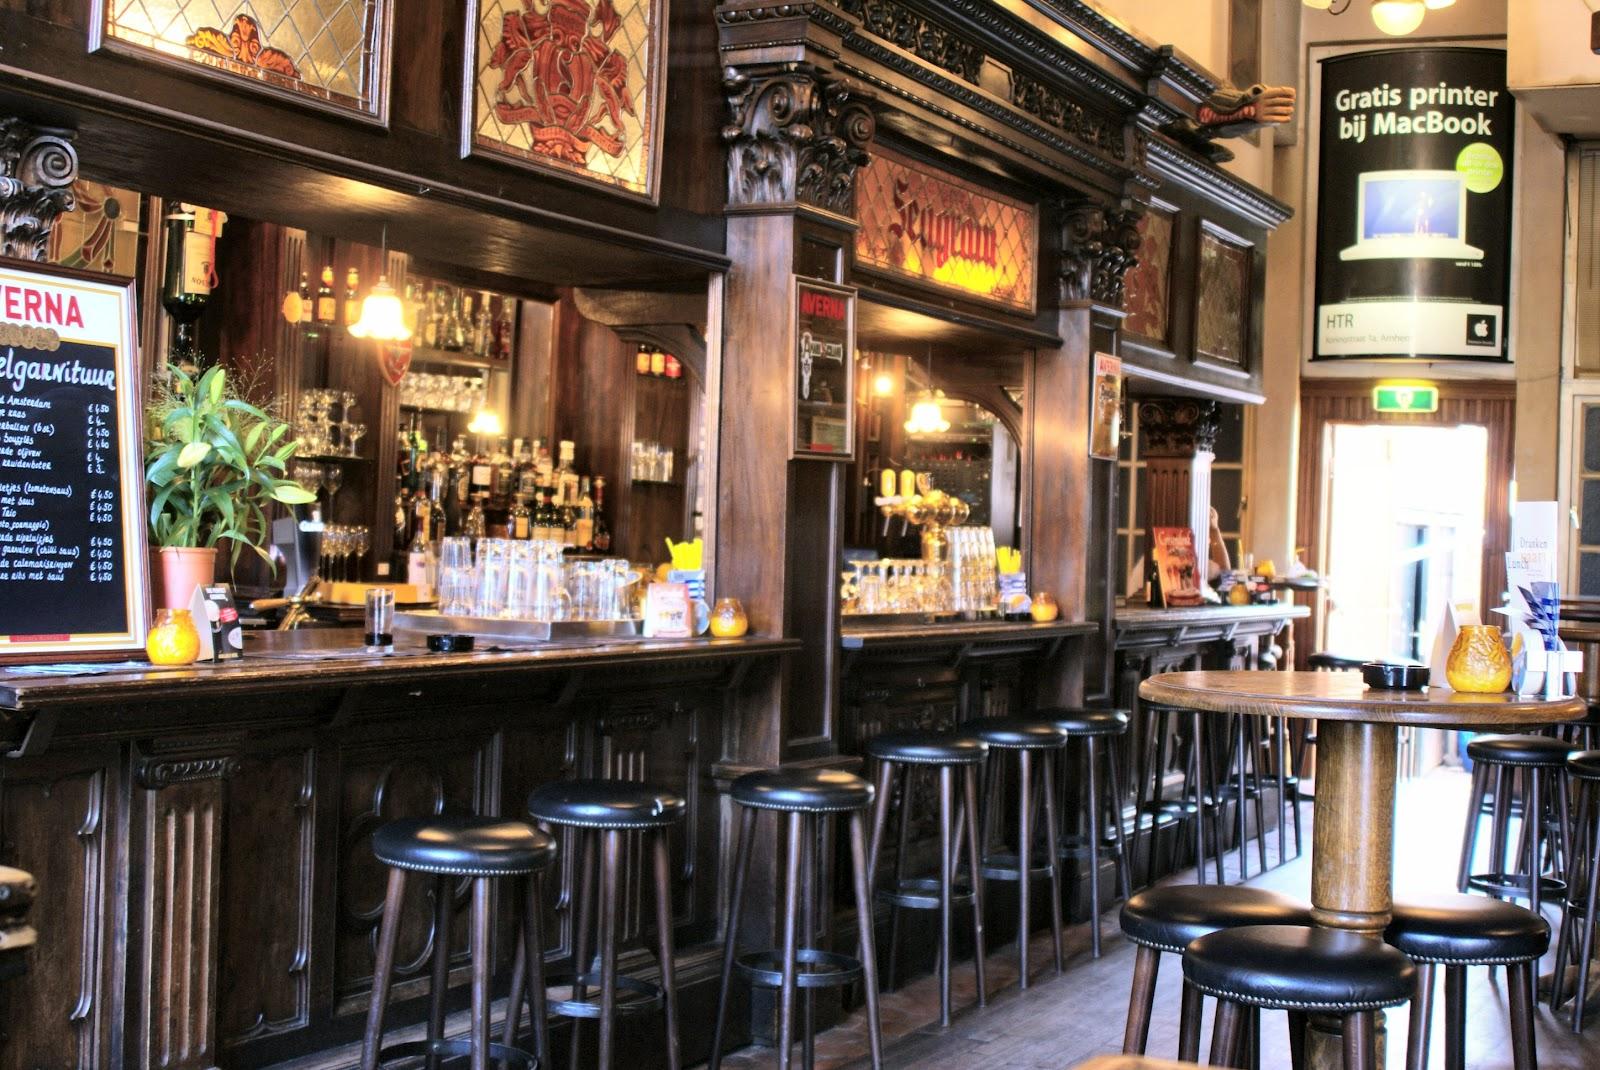 Trevor 39 s tracks in so cal september 2012 - Pictures of bars ...